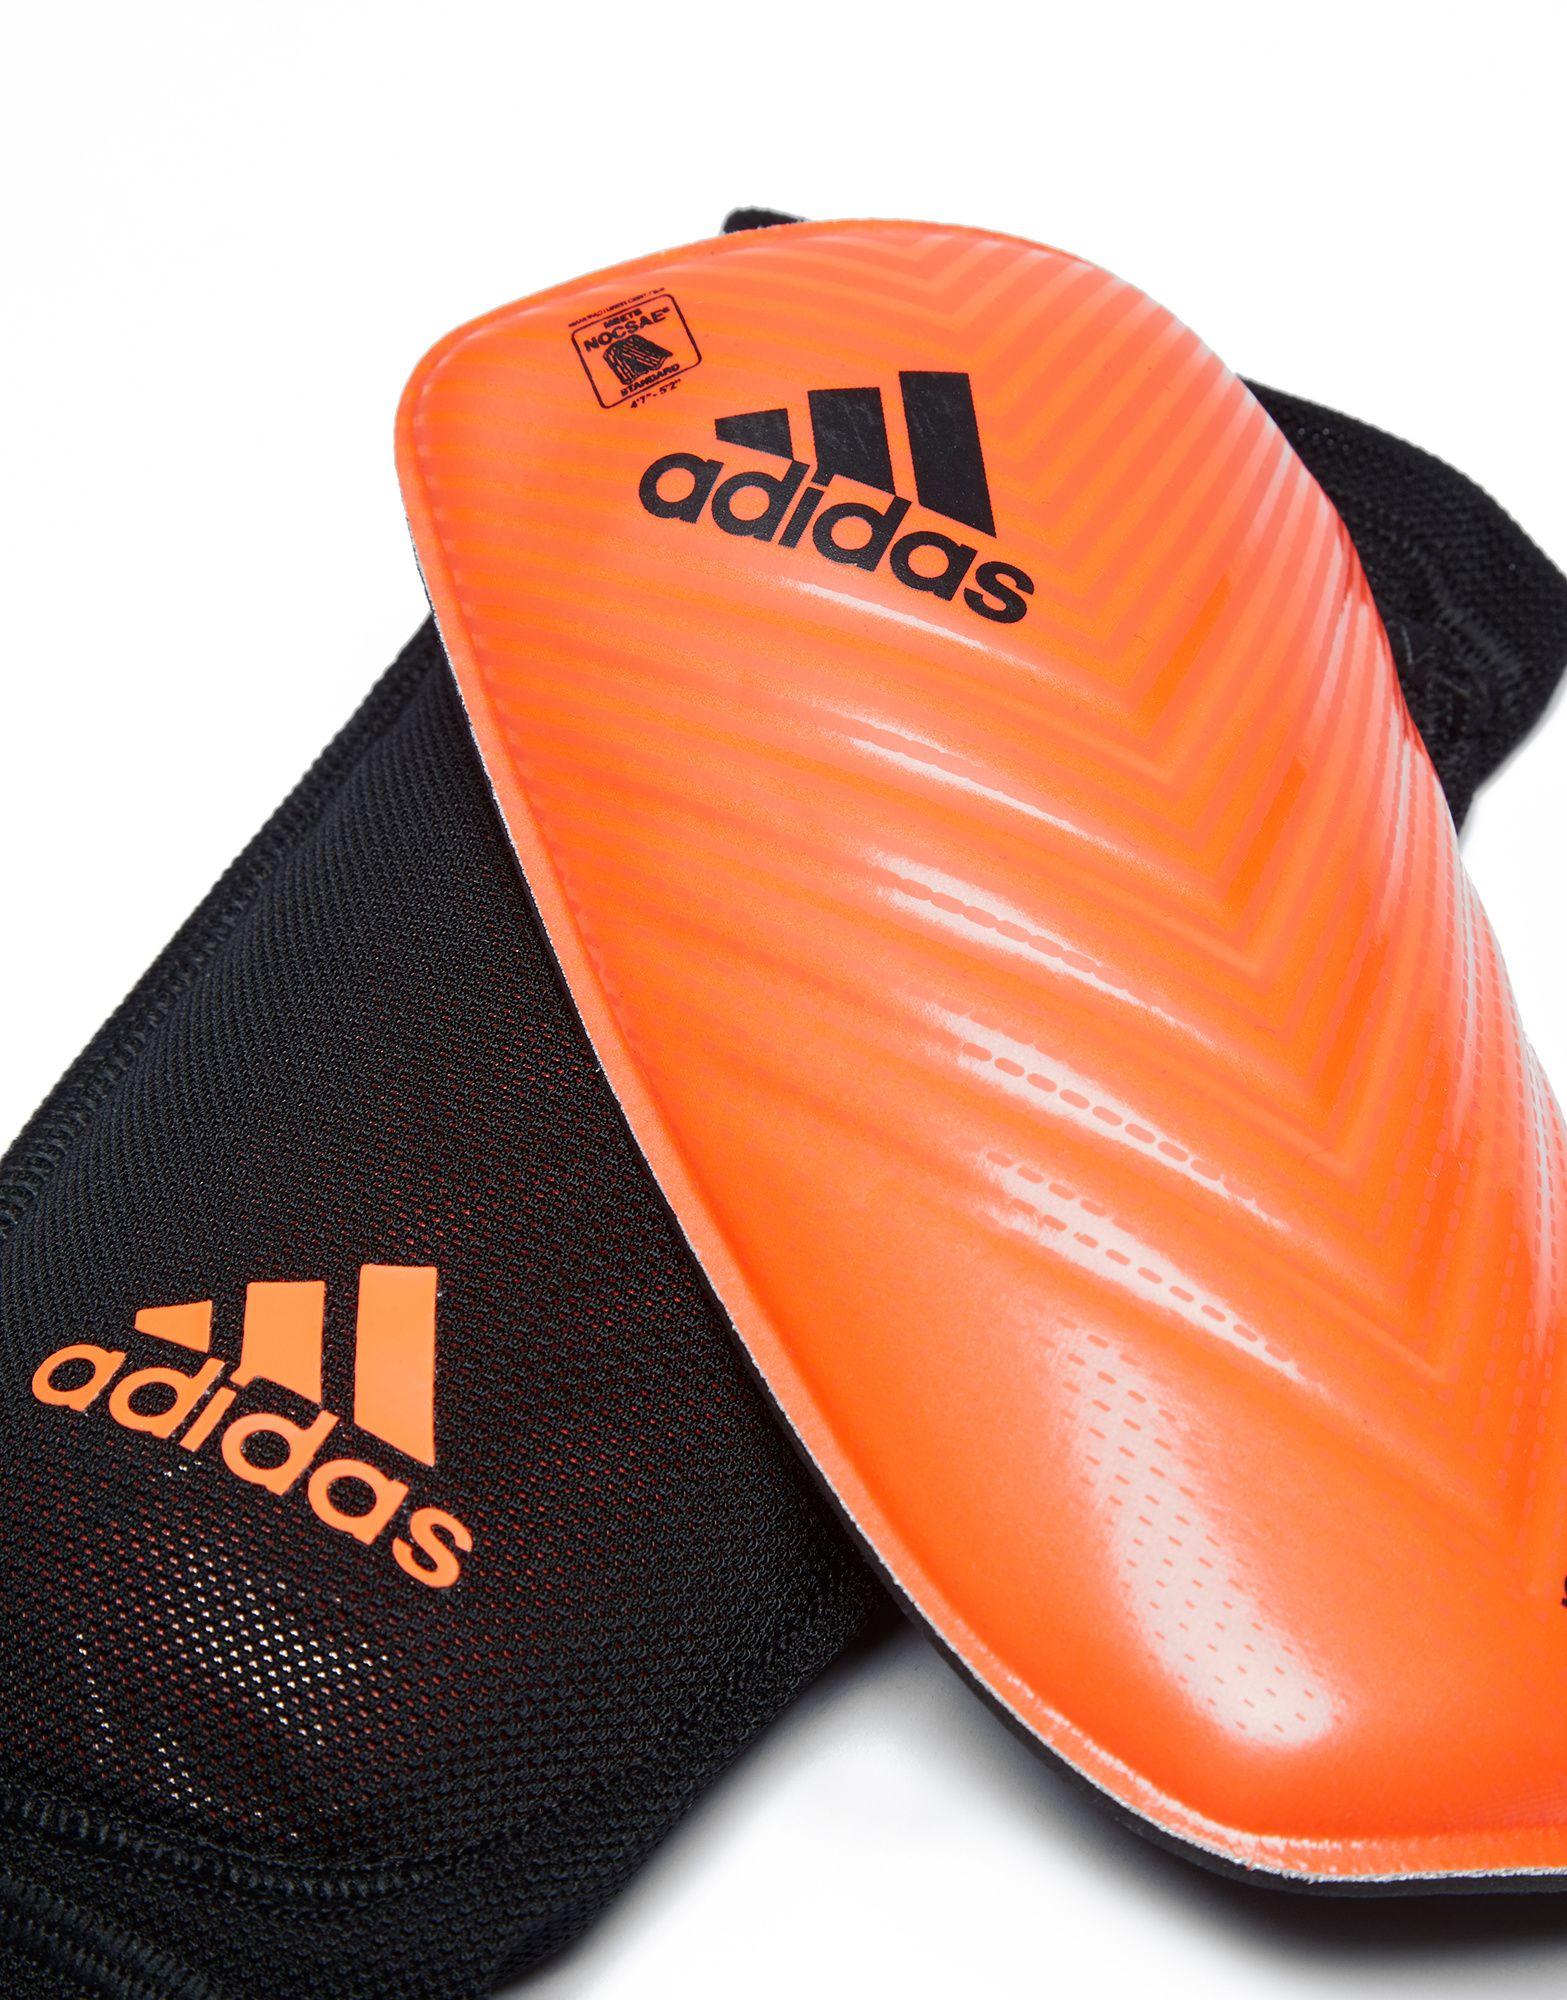 adidas Predator Pro Mold Shin Guard